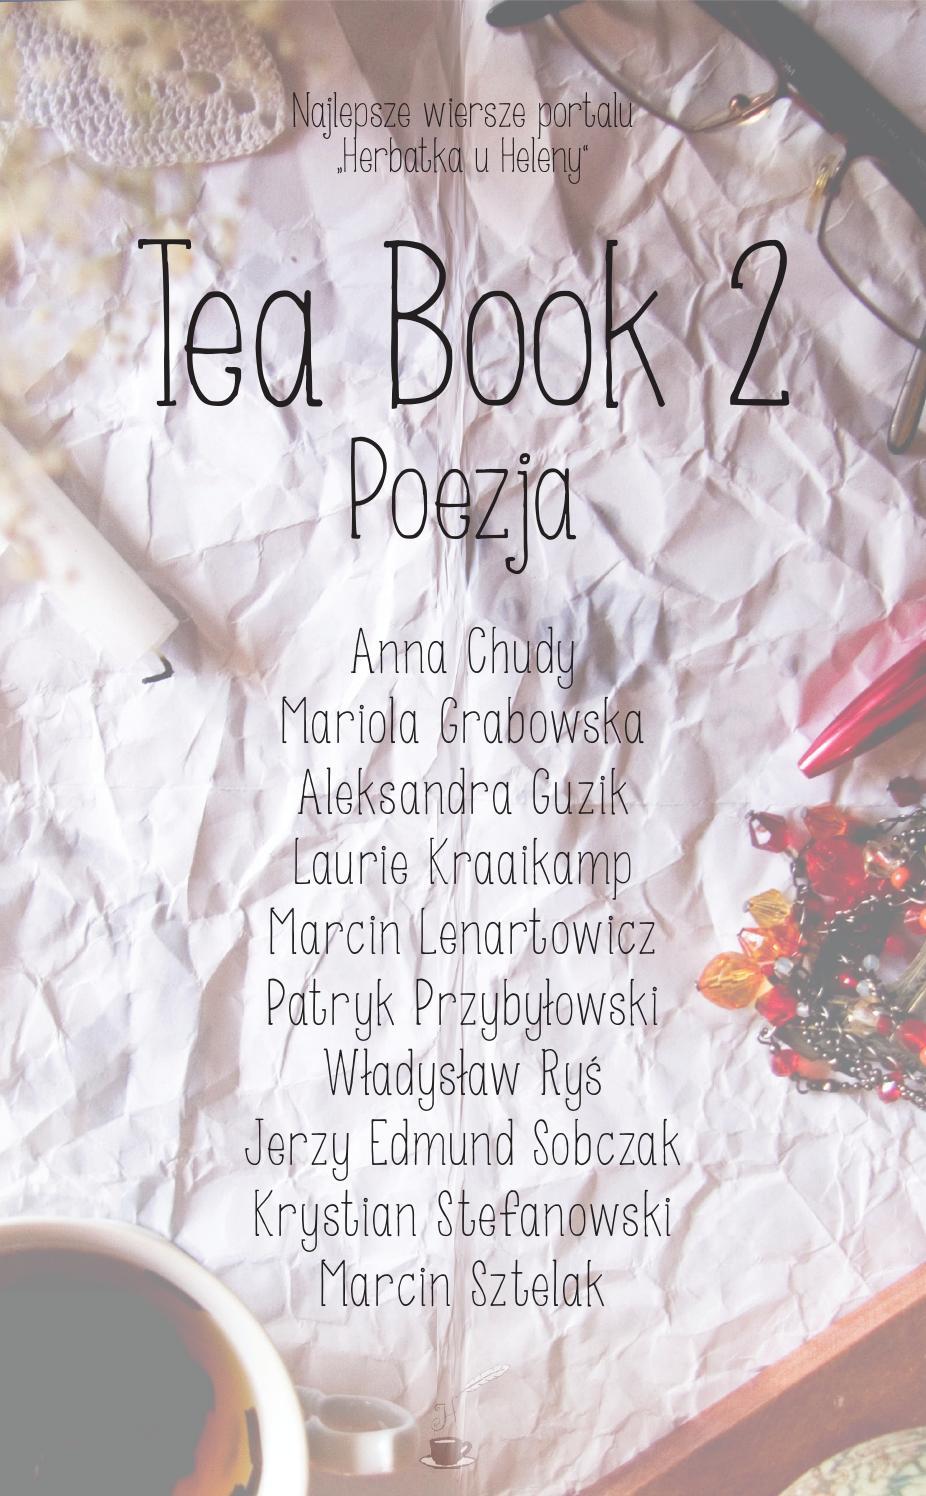 Tea Book 2 Poezja By Herbatka U Heleny Issuu